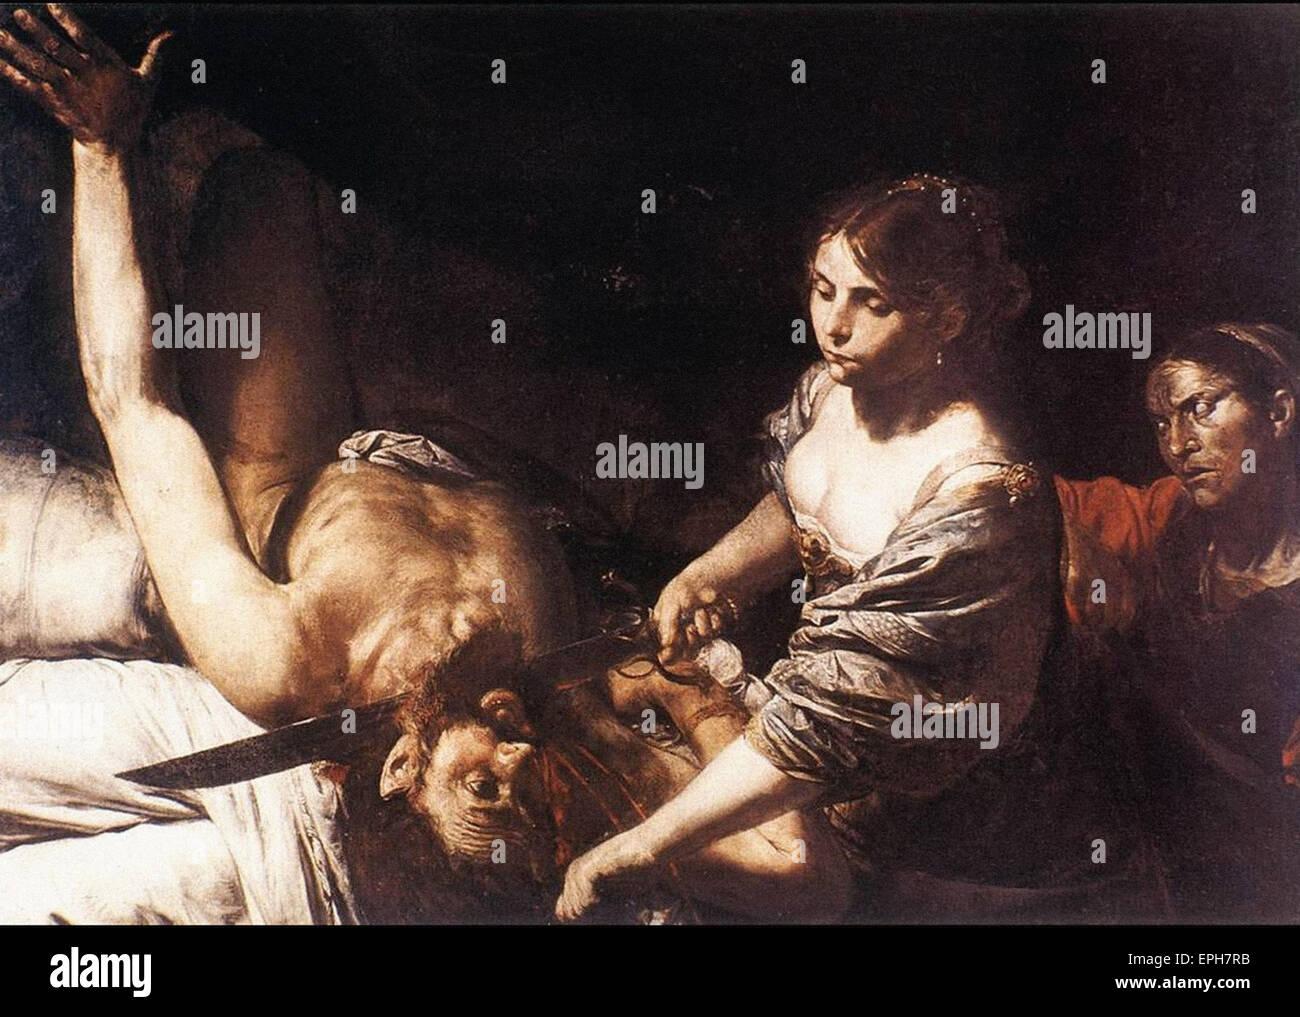 Valentin de Boulogne  Judith and Holofernes - Stock Image